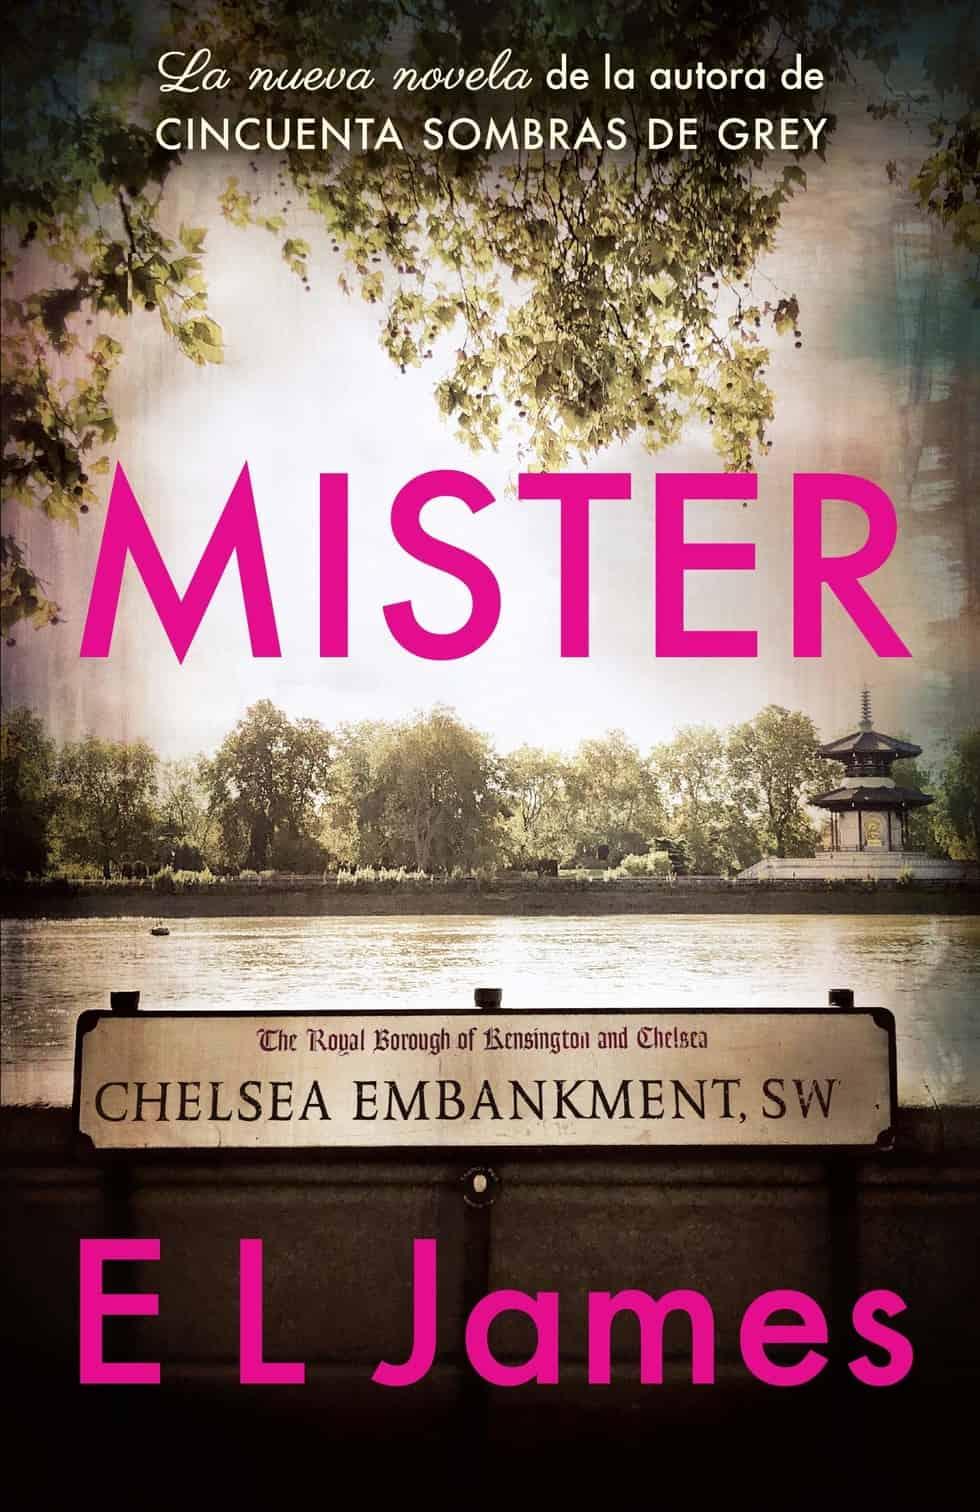 Literatura erótica - Mister - E.L. James -